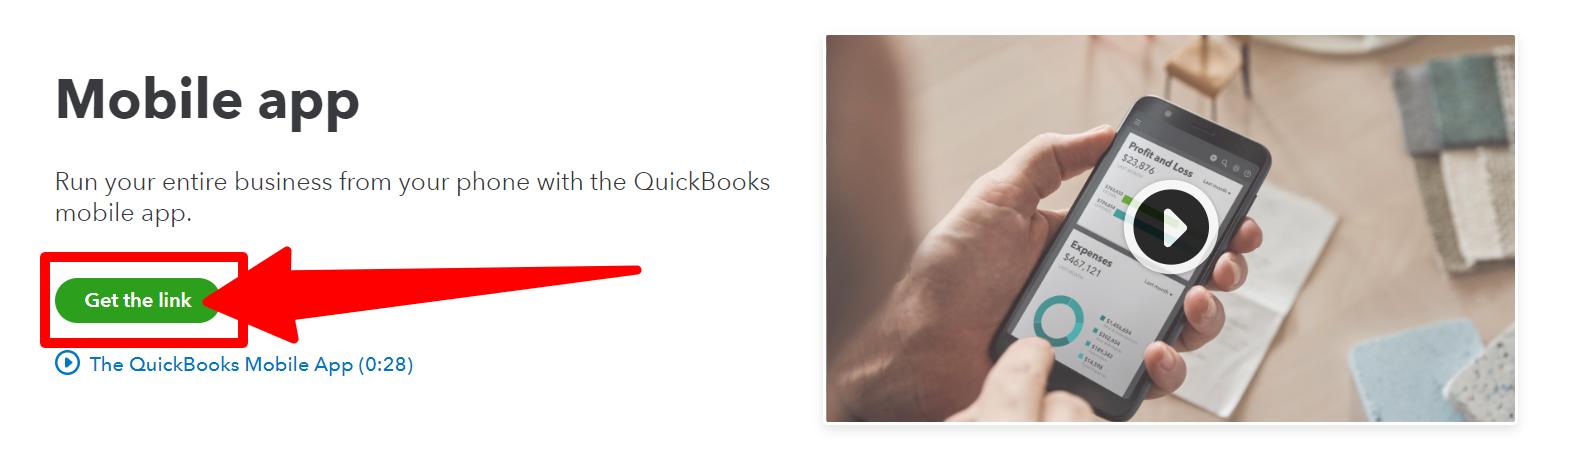 QuickBooks_Online_mobile_app_